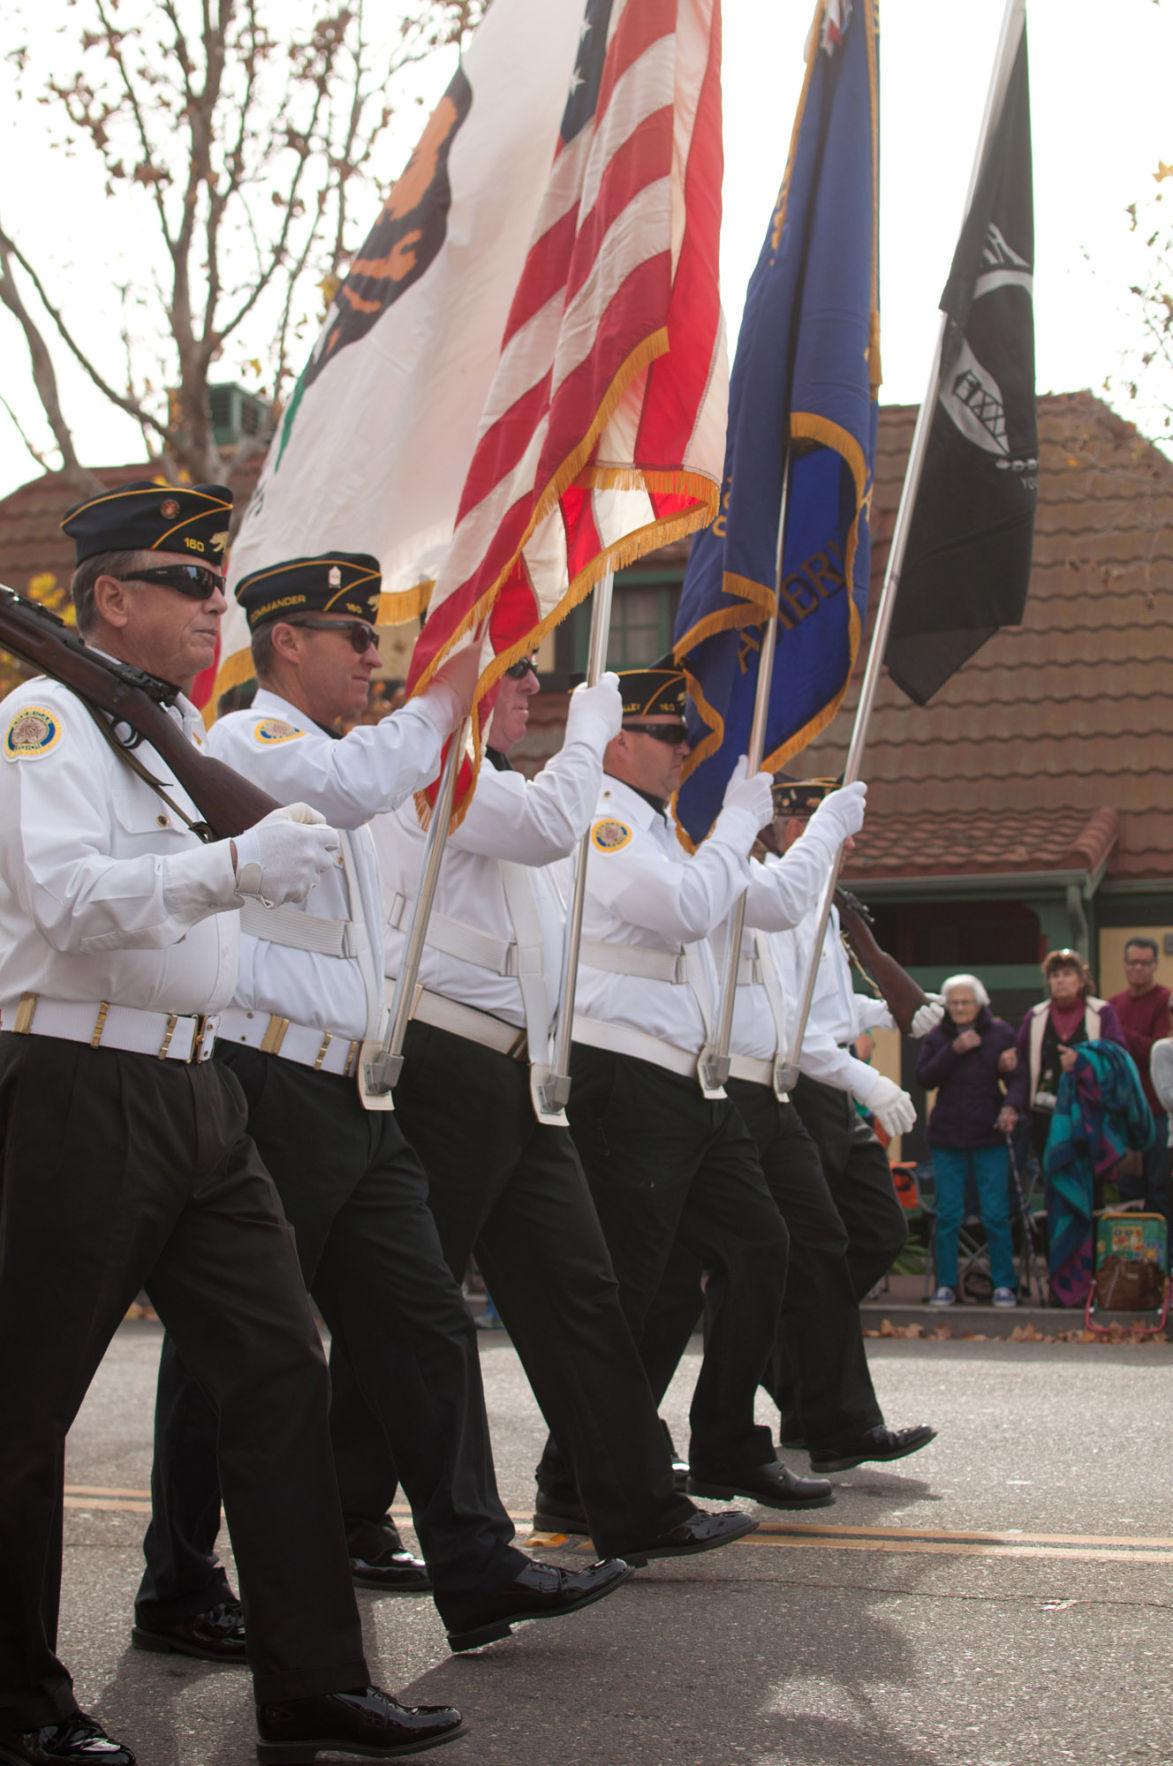 121015 Solvang Parade-1.jpg